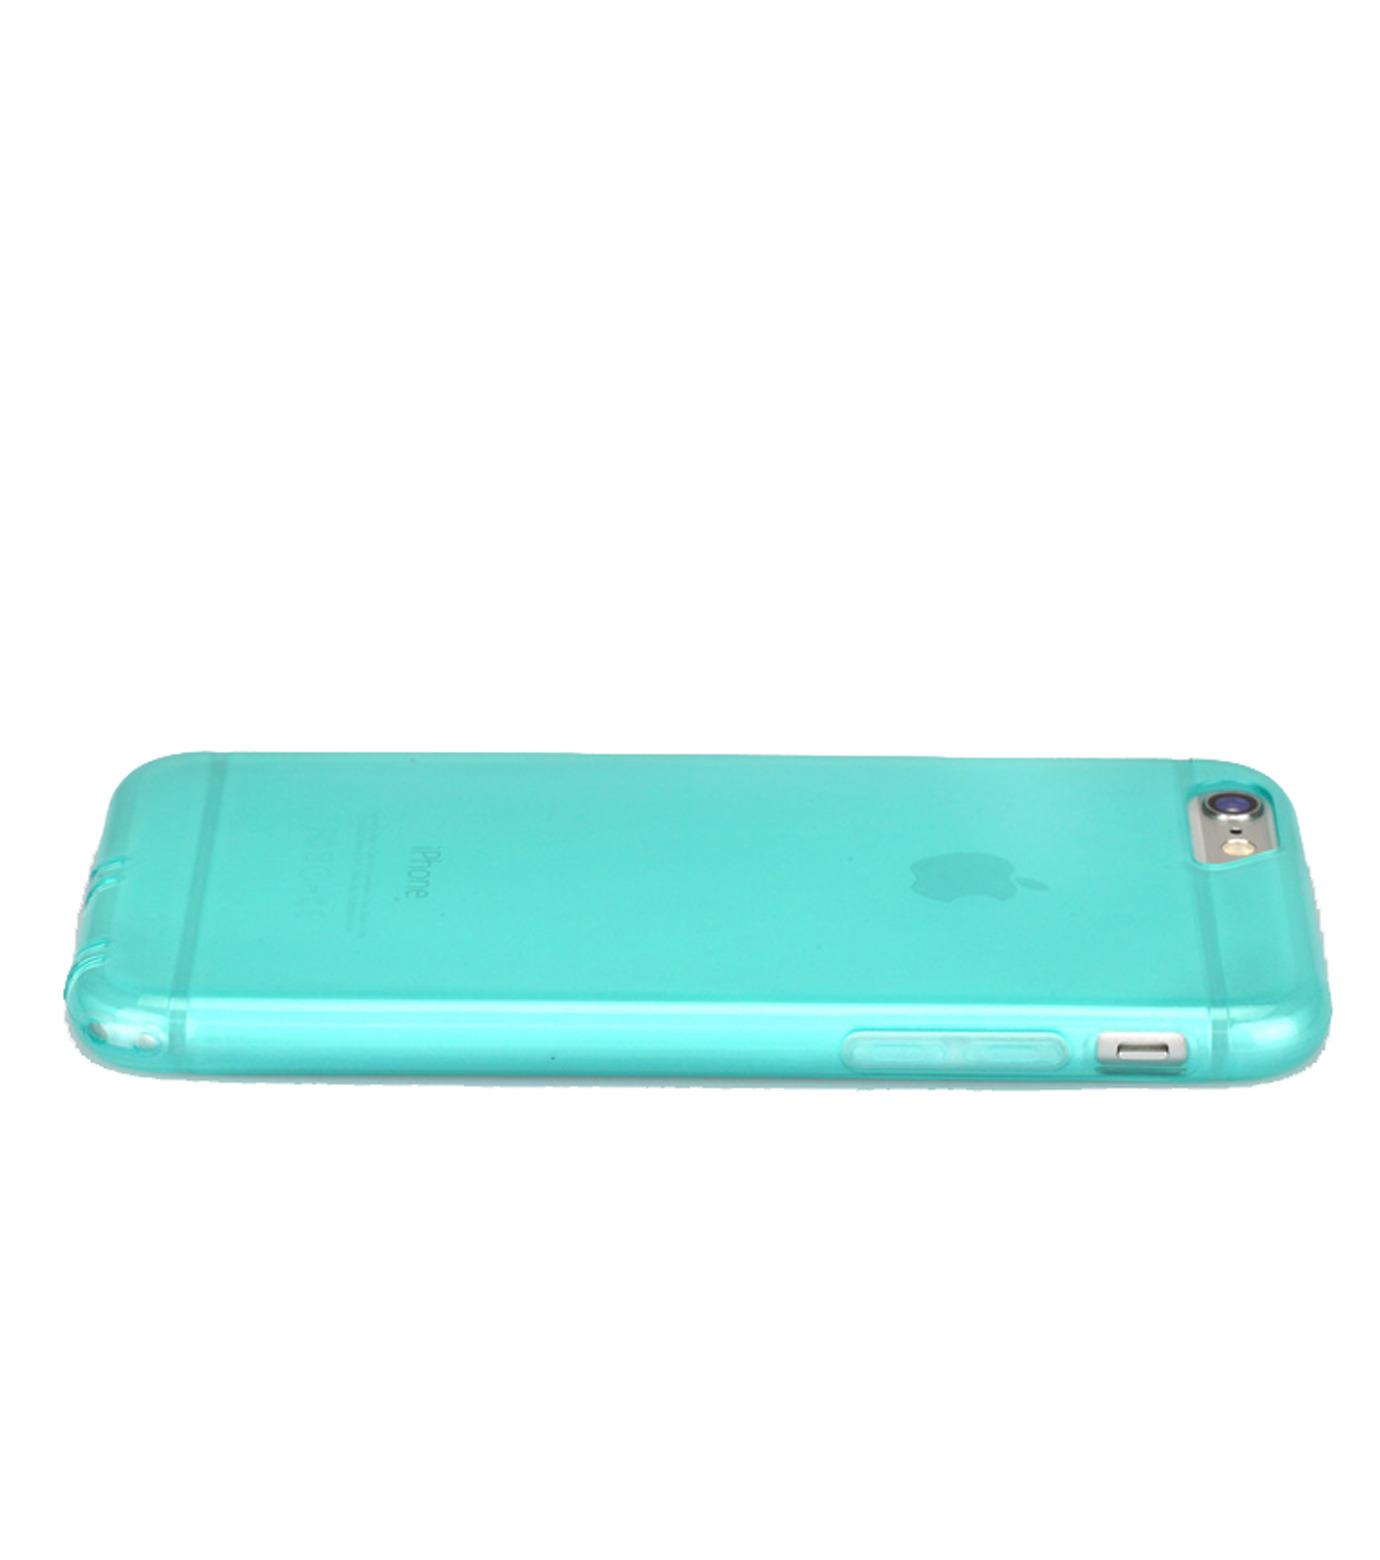 Tunewear(チューンウエア)のsoftshell 6/6s-CHARCHOL GRAY(ケースiphone6/6s/case iphone6/6s)-TUN-PH-0399-12 拡大詳細画像2